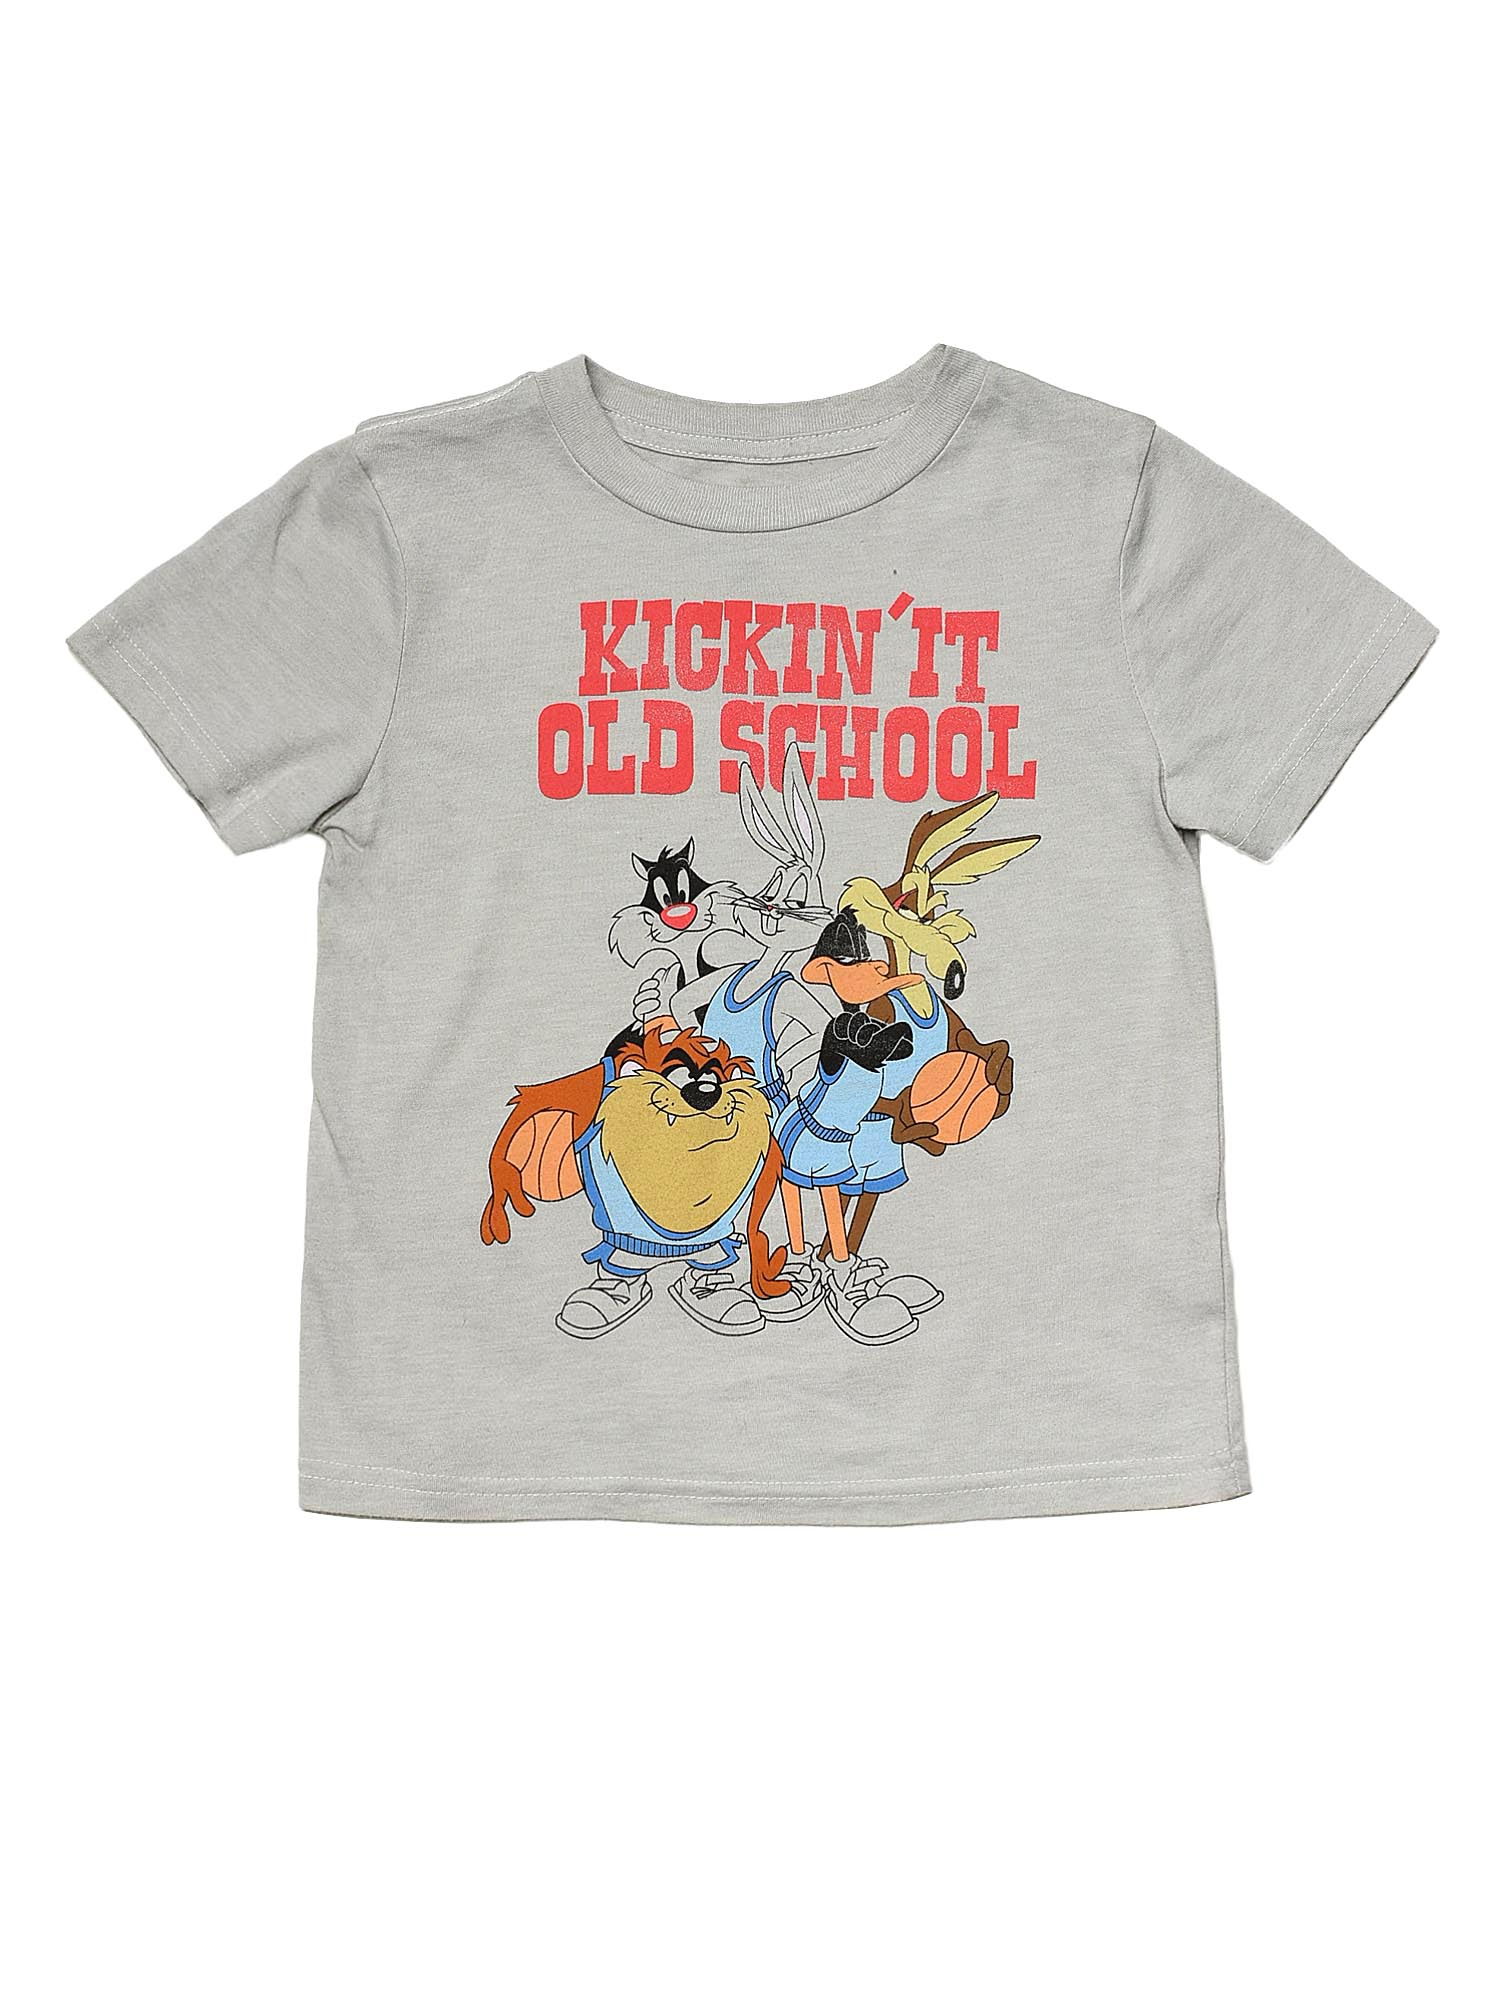 Toddler Boys Bugs Bunny Daffy Duck T-shirt Gray Old School Retro Cartoon